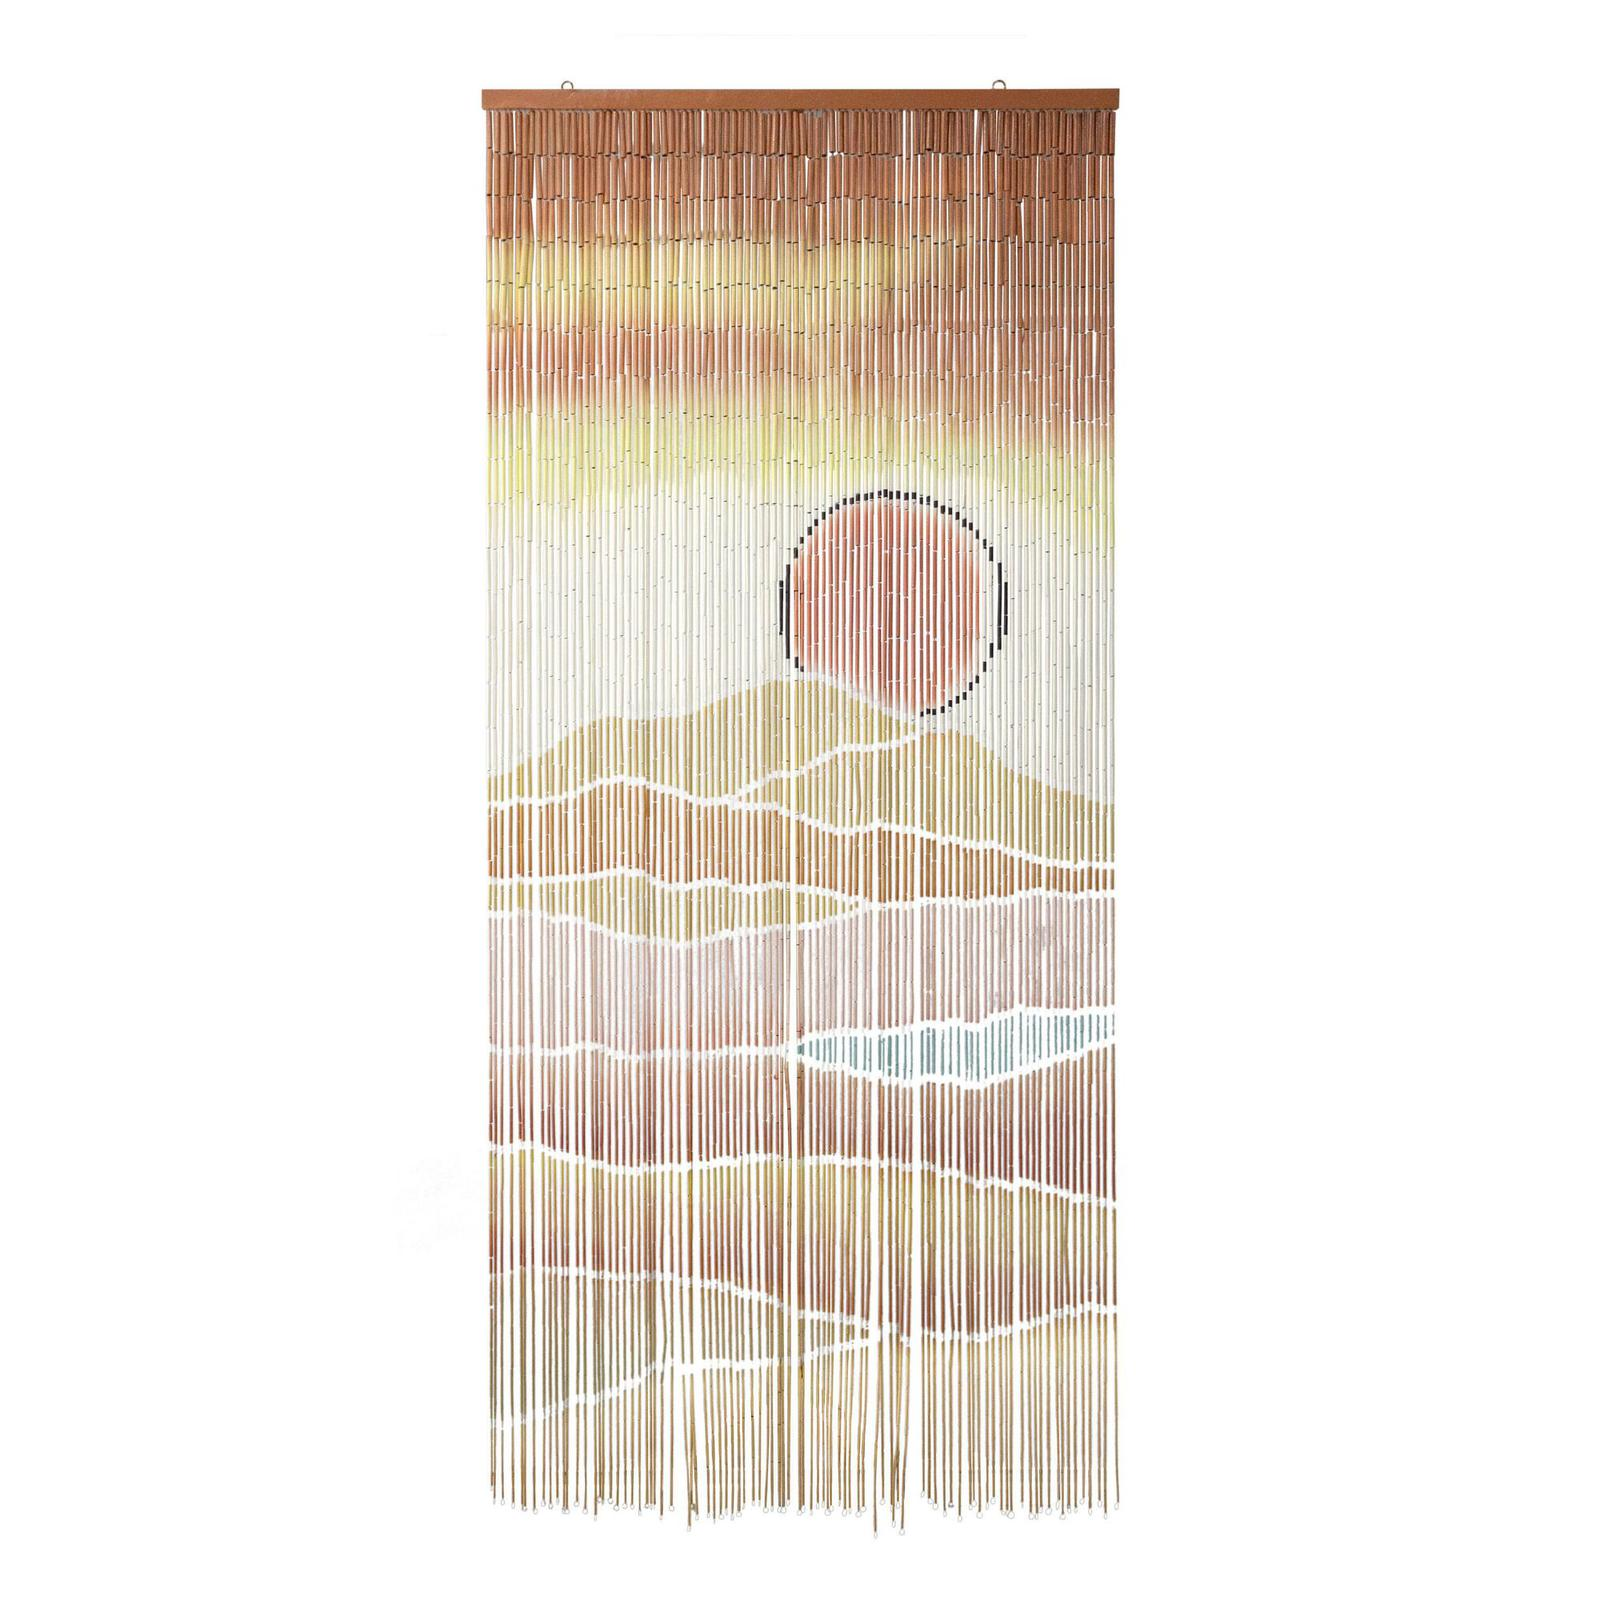 Bamboo Beads are Boho-tastic